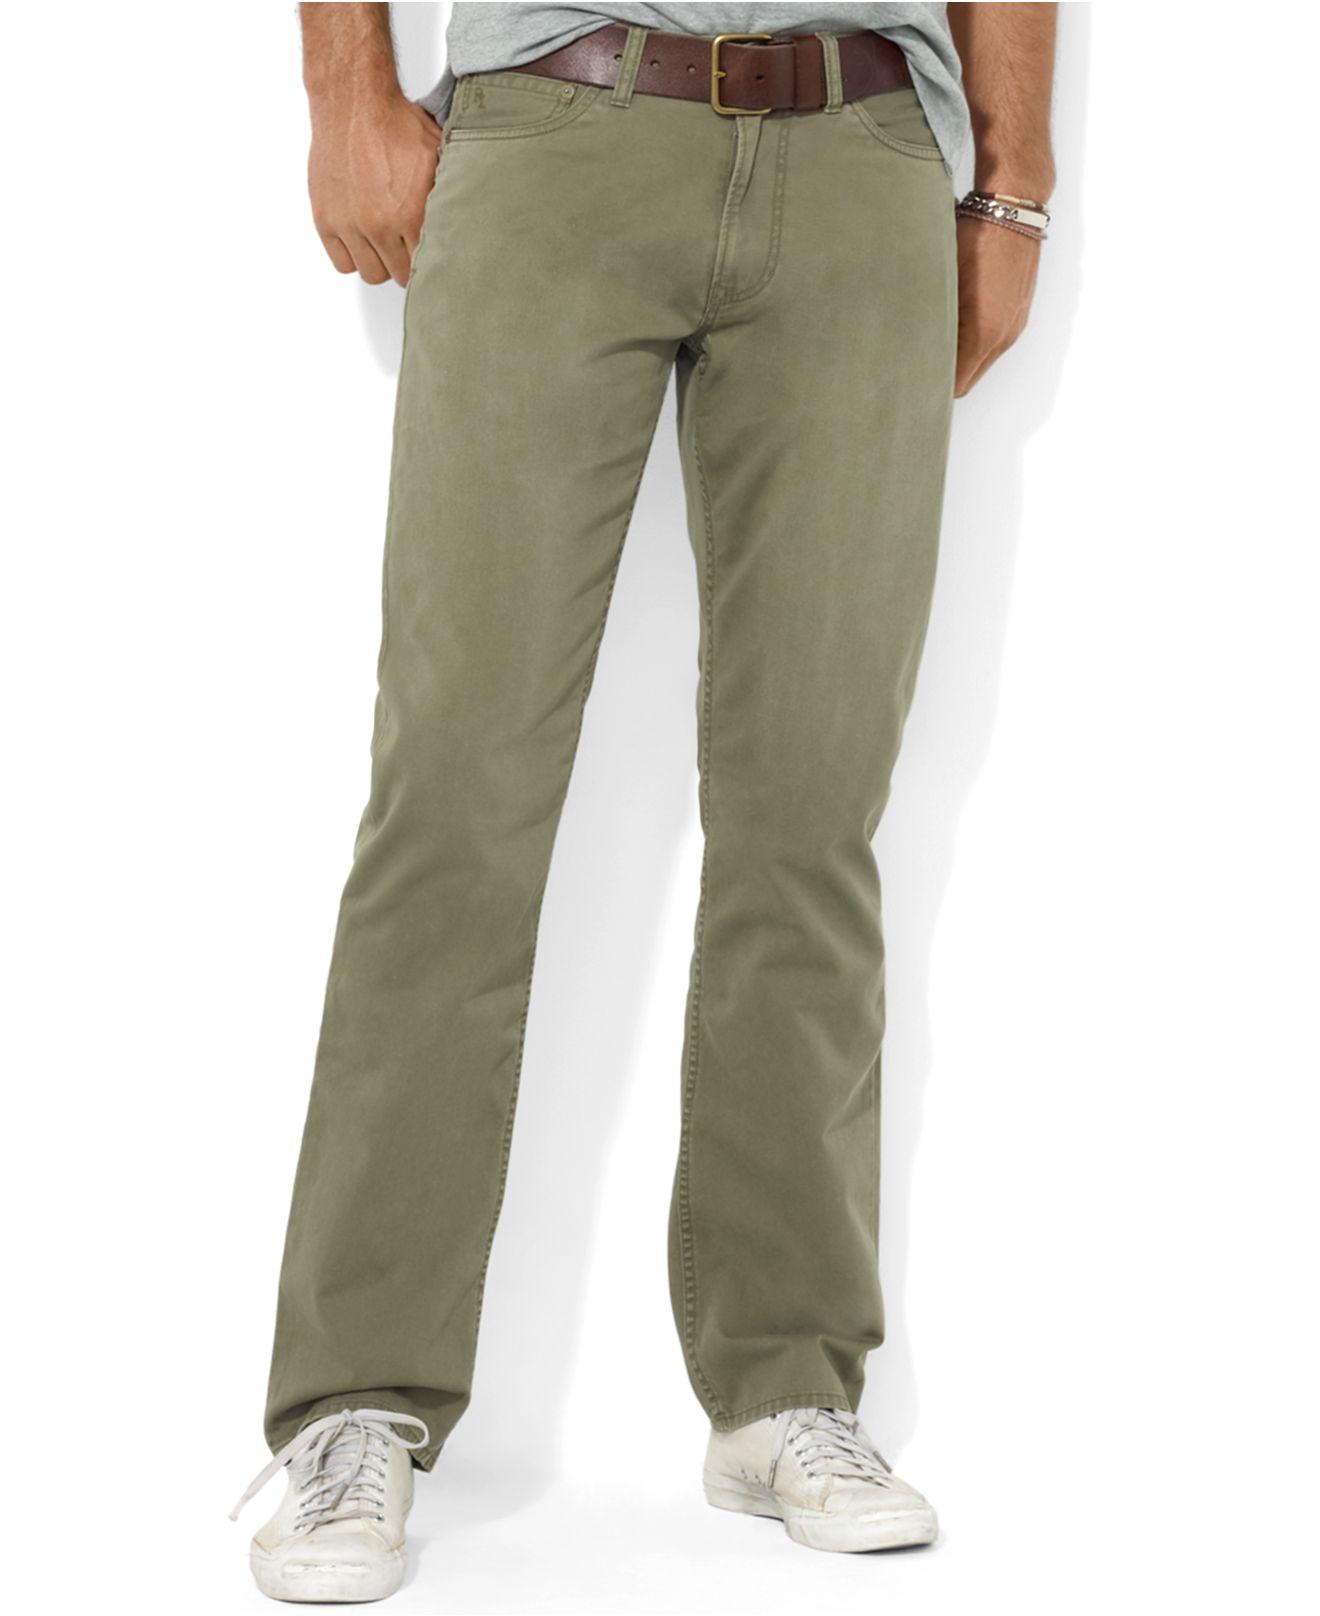 Polo Ralph Lauren Men/'s Core Straight Fit 5 Pocket Chino Pants